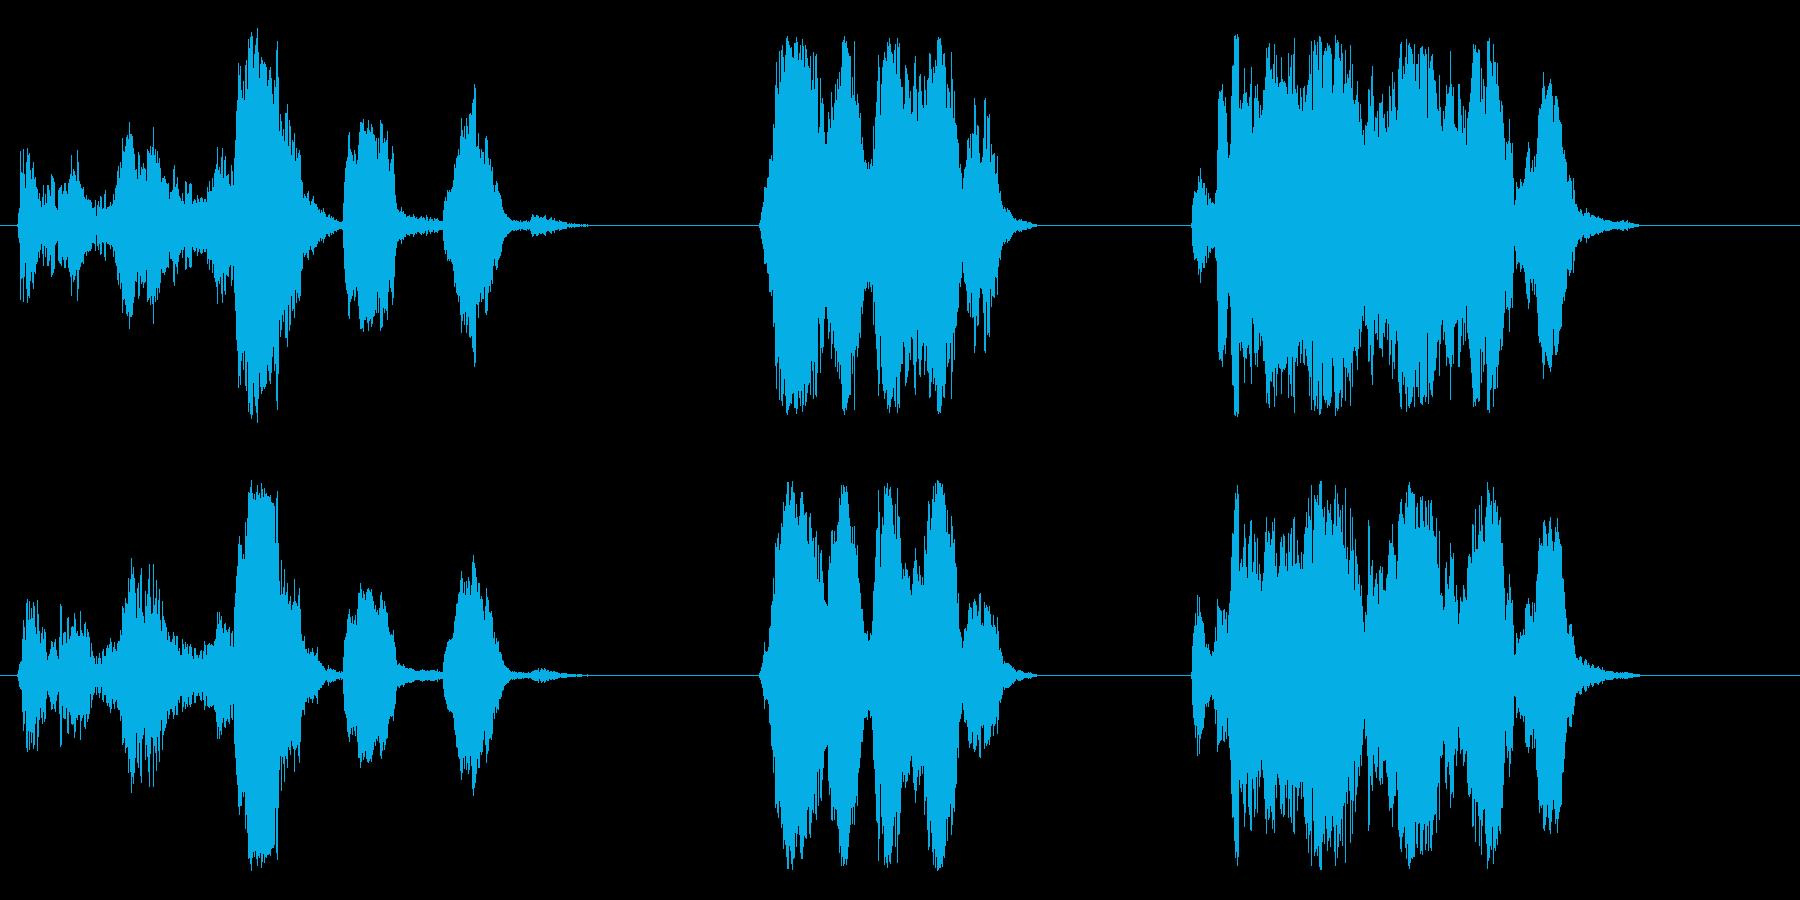 Peacocks Cry X 3;鳥の再生済みの波形